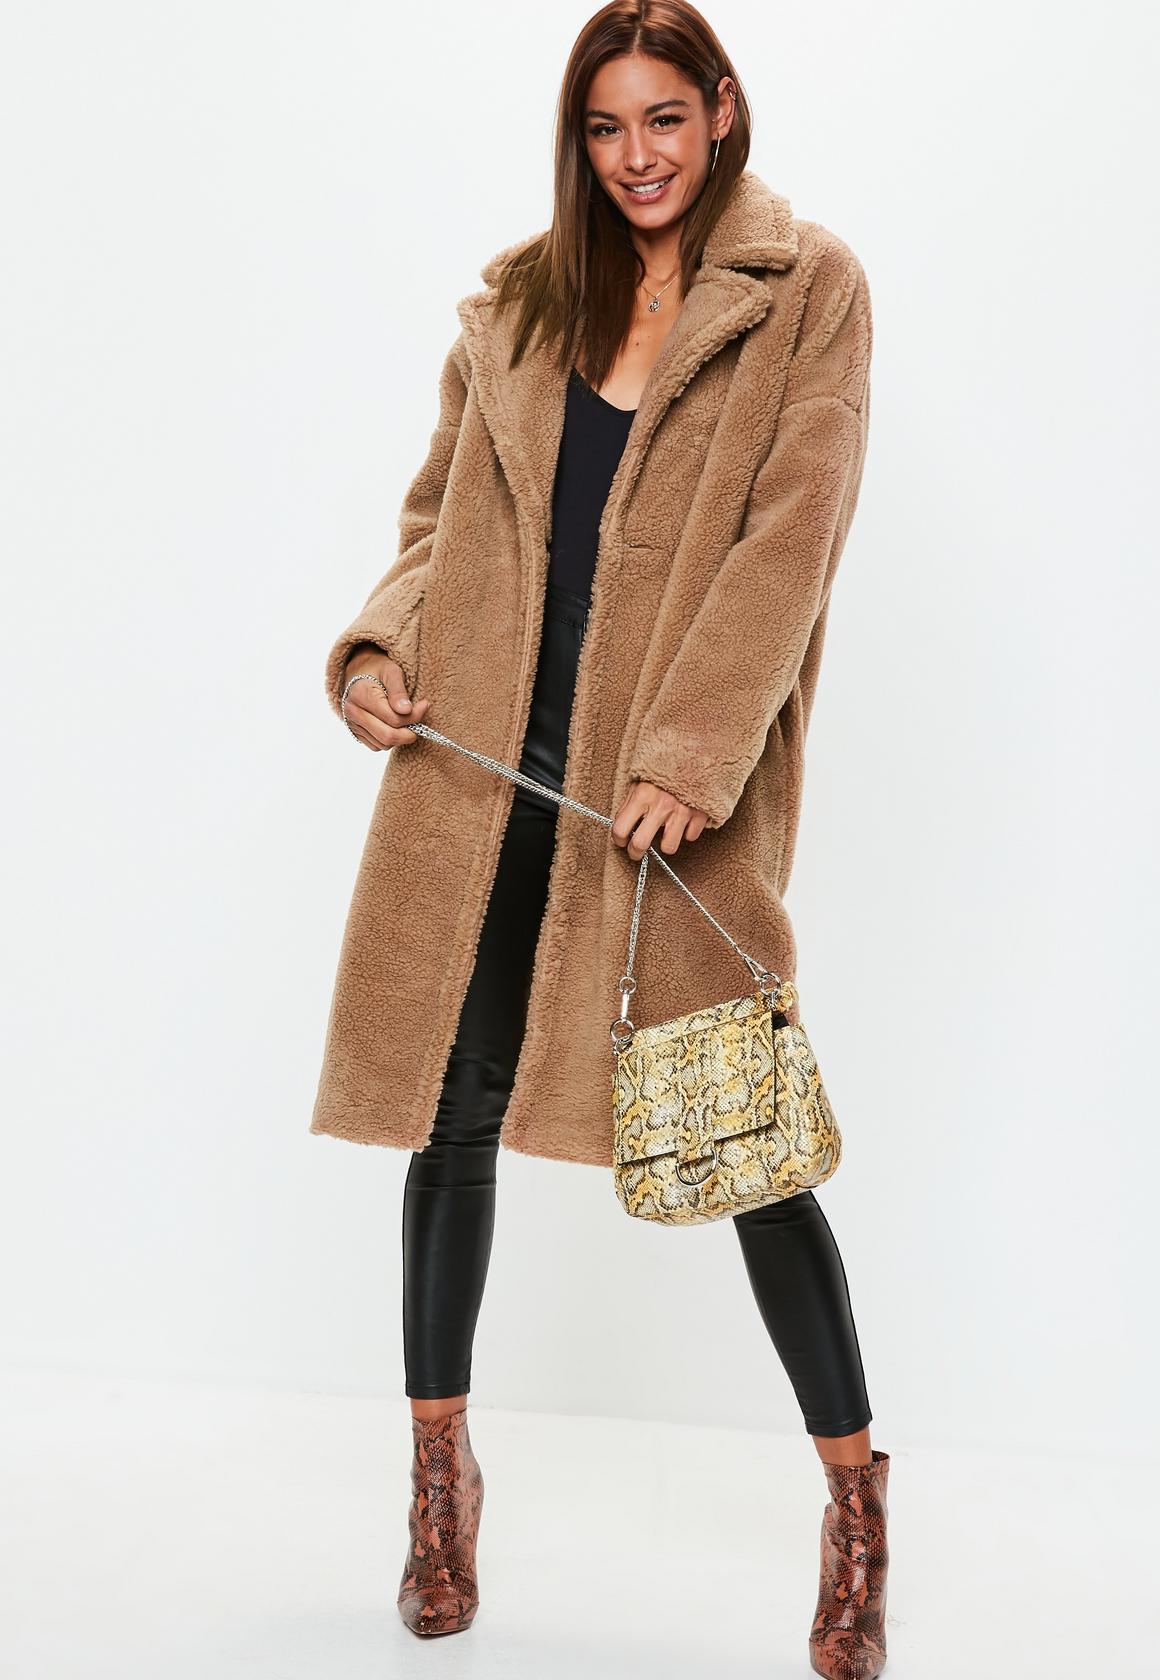 caramel-chunky-borg-crombie-coat.jpg